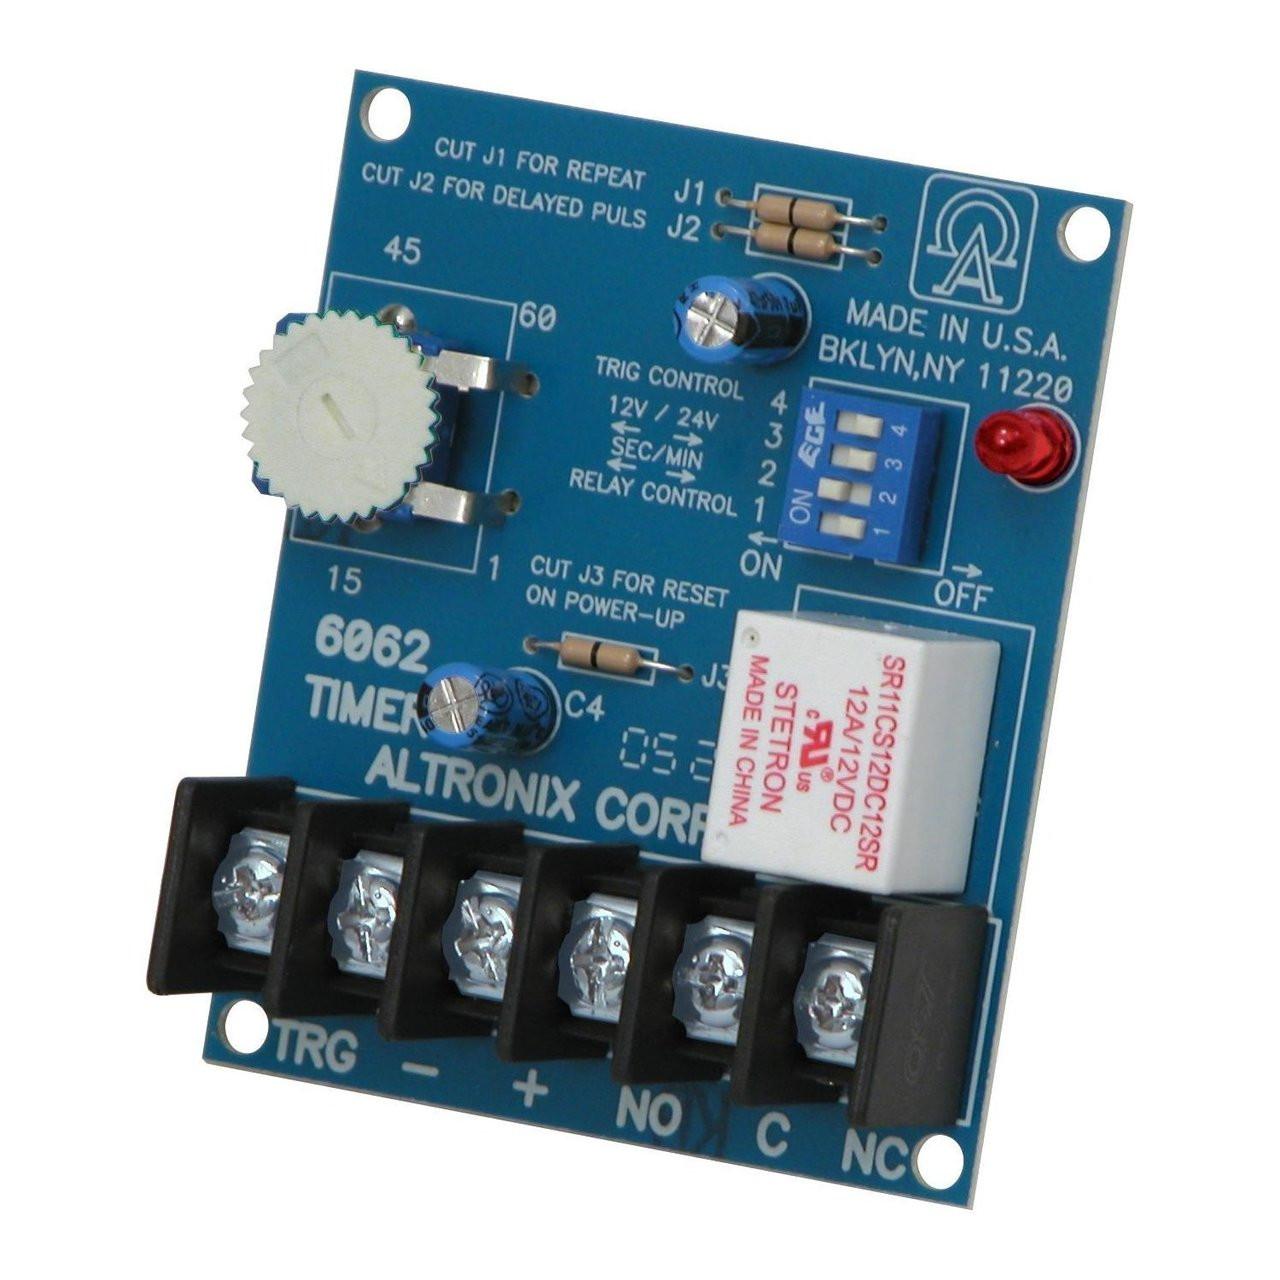 Altronix 6062 Multi-Function Timer - 12VDC or 24VDC